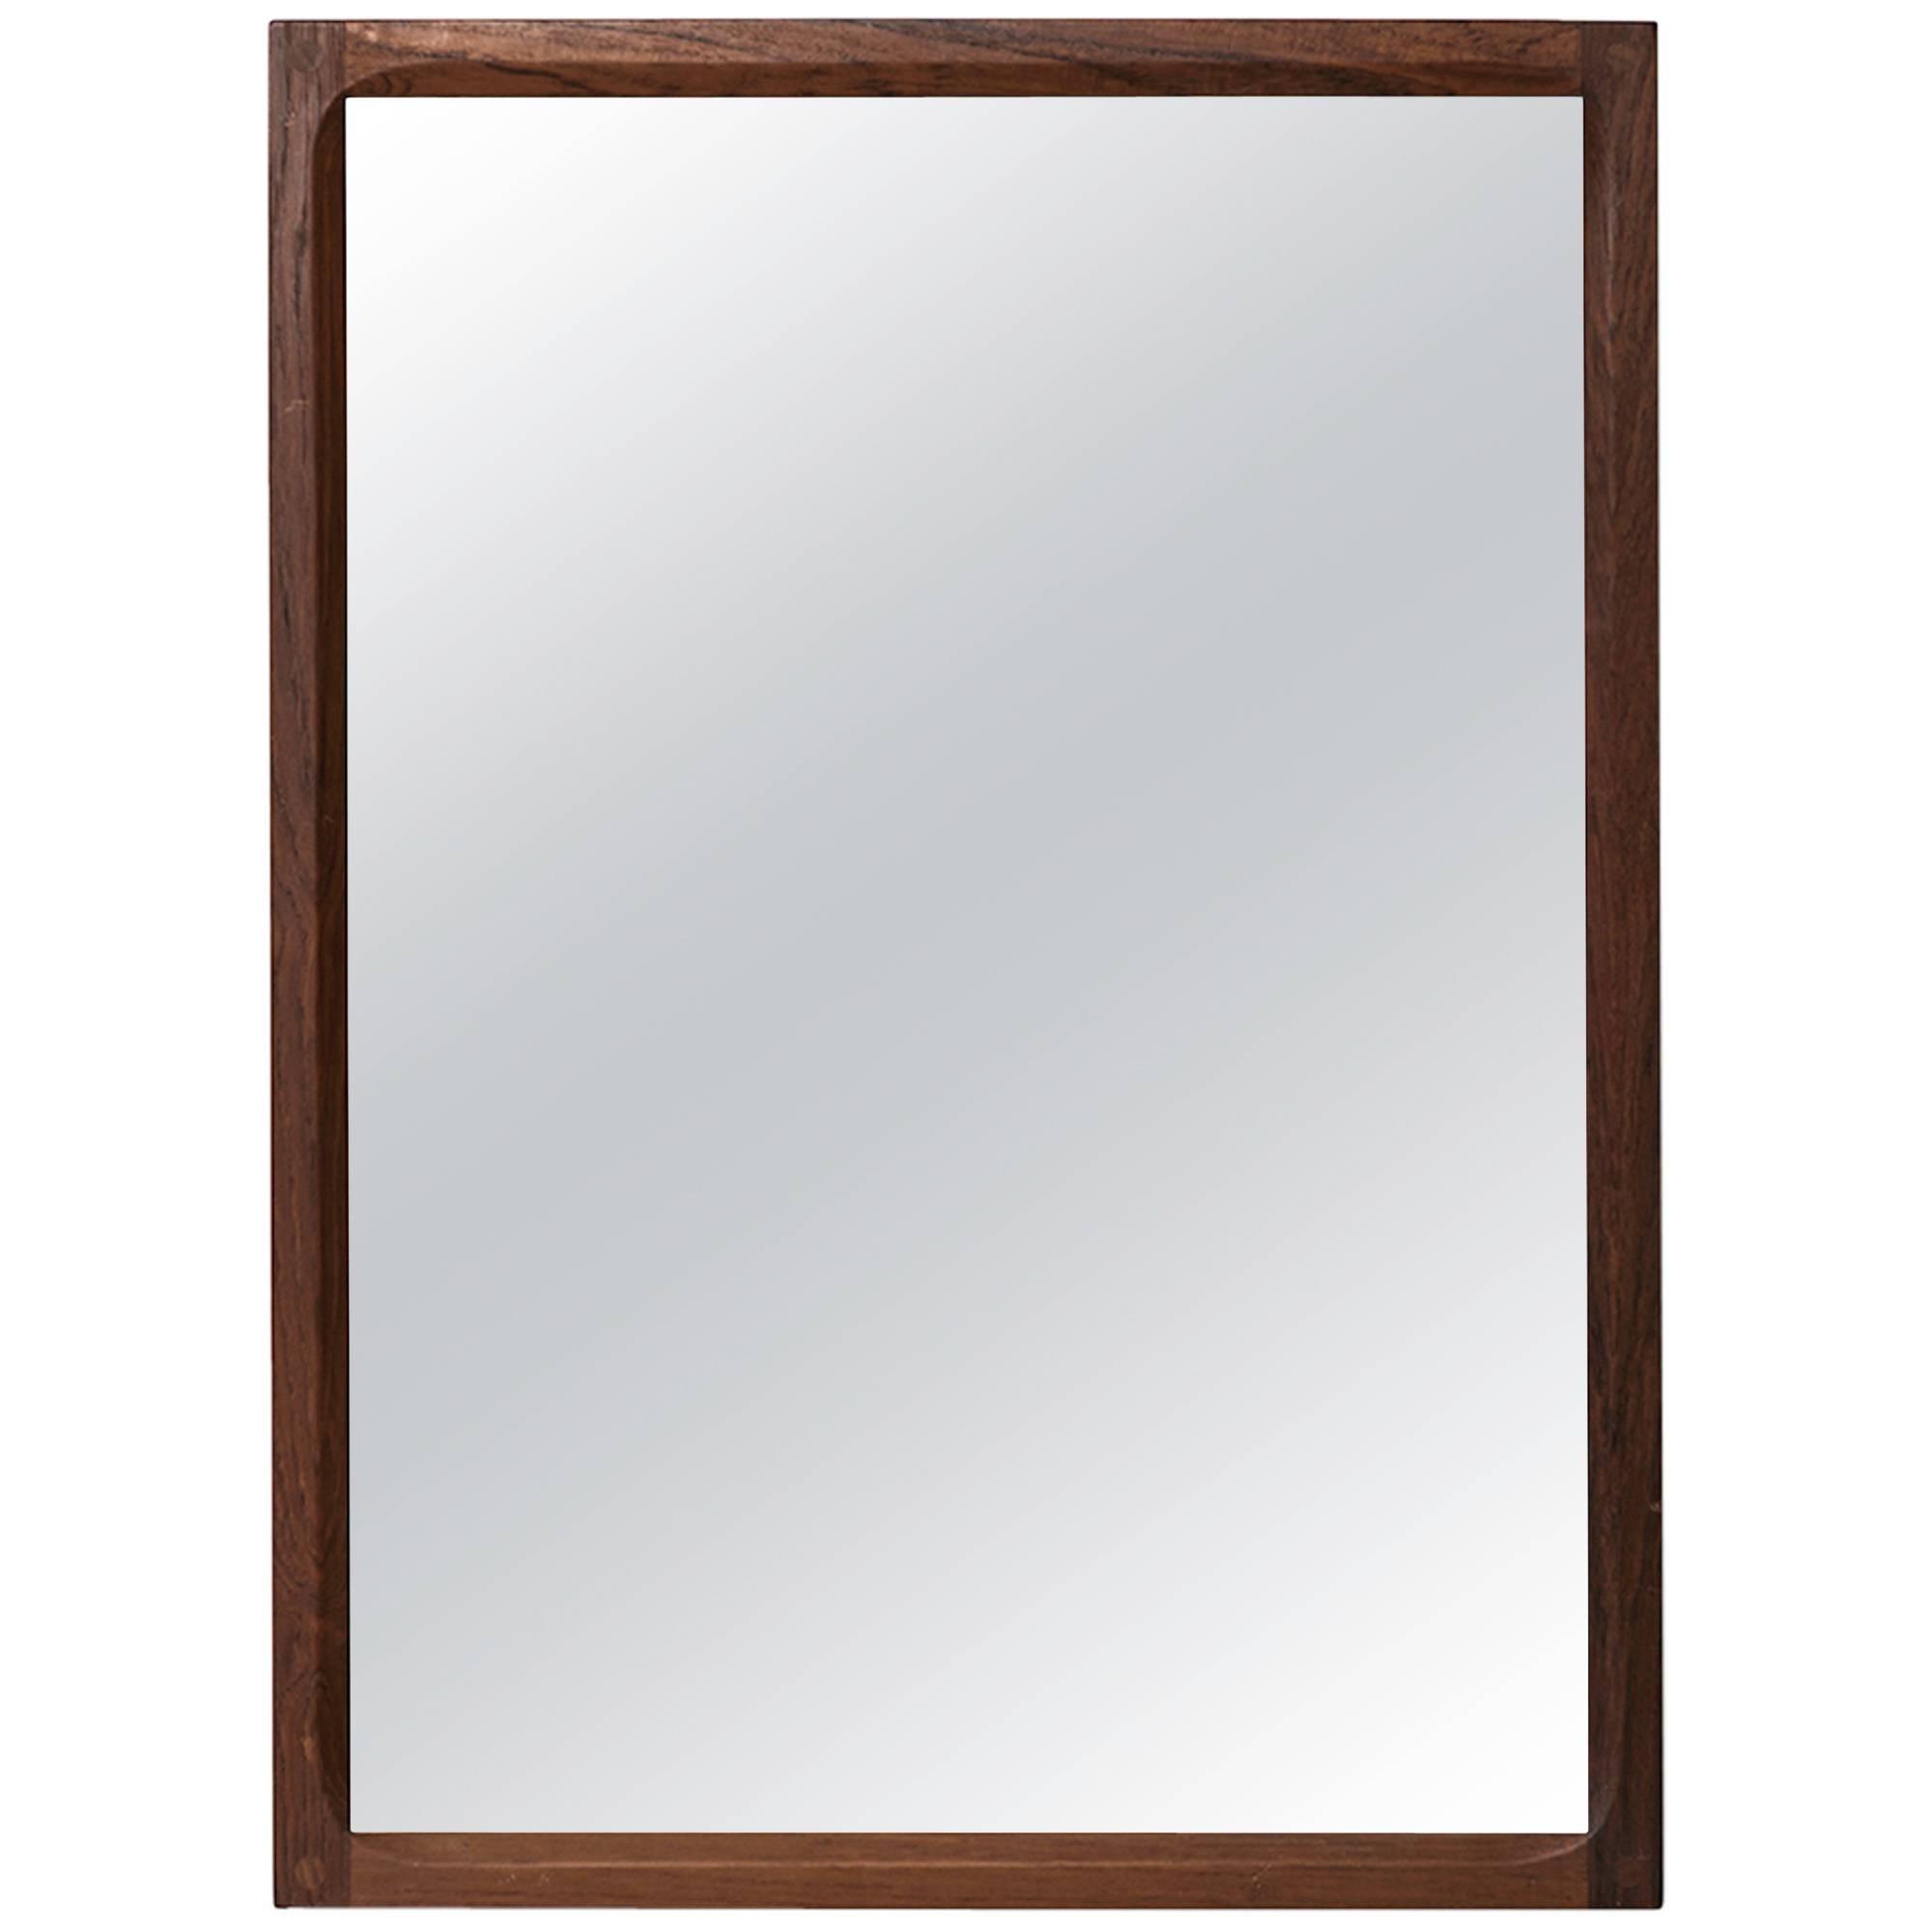 Aksel Kjersgaard Mirror in Rosewood by Odder in Denmark